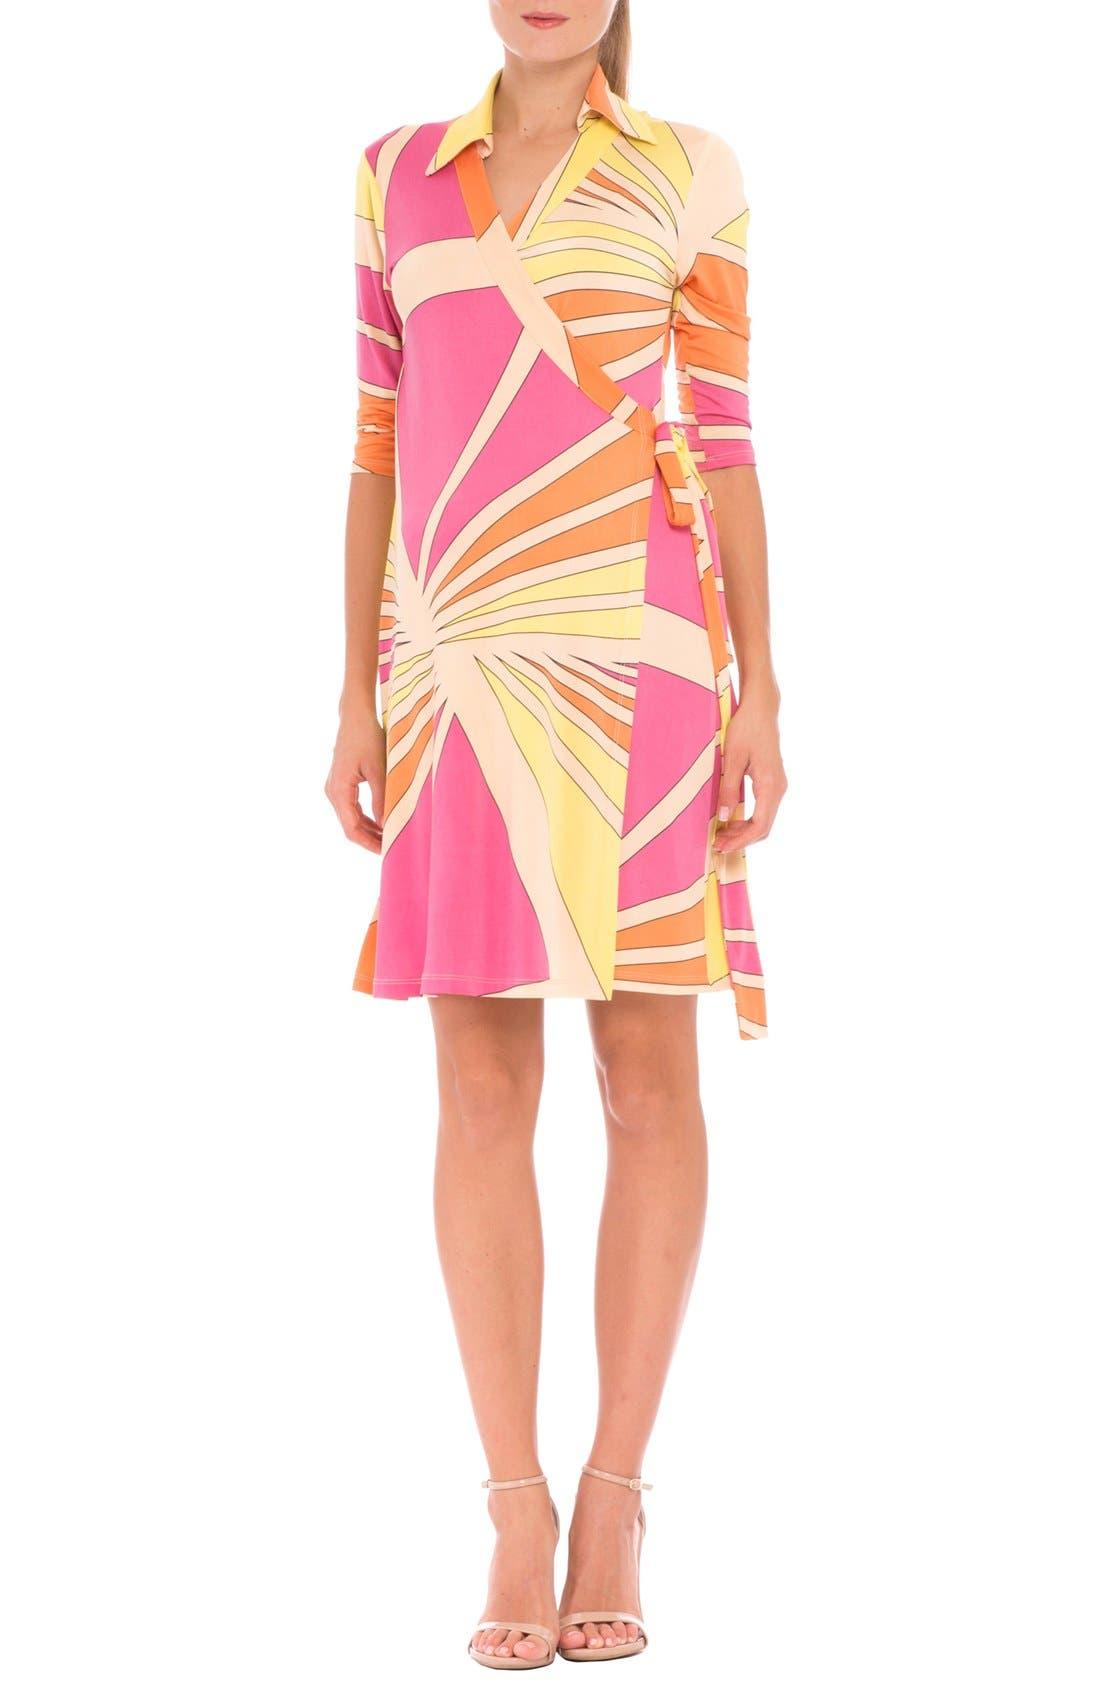 Olian 'Trisha' Matnernity Wrap Dress